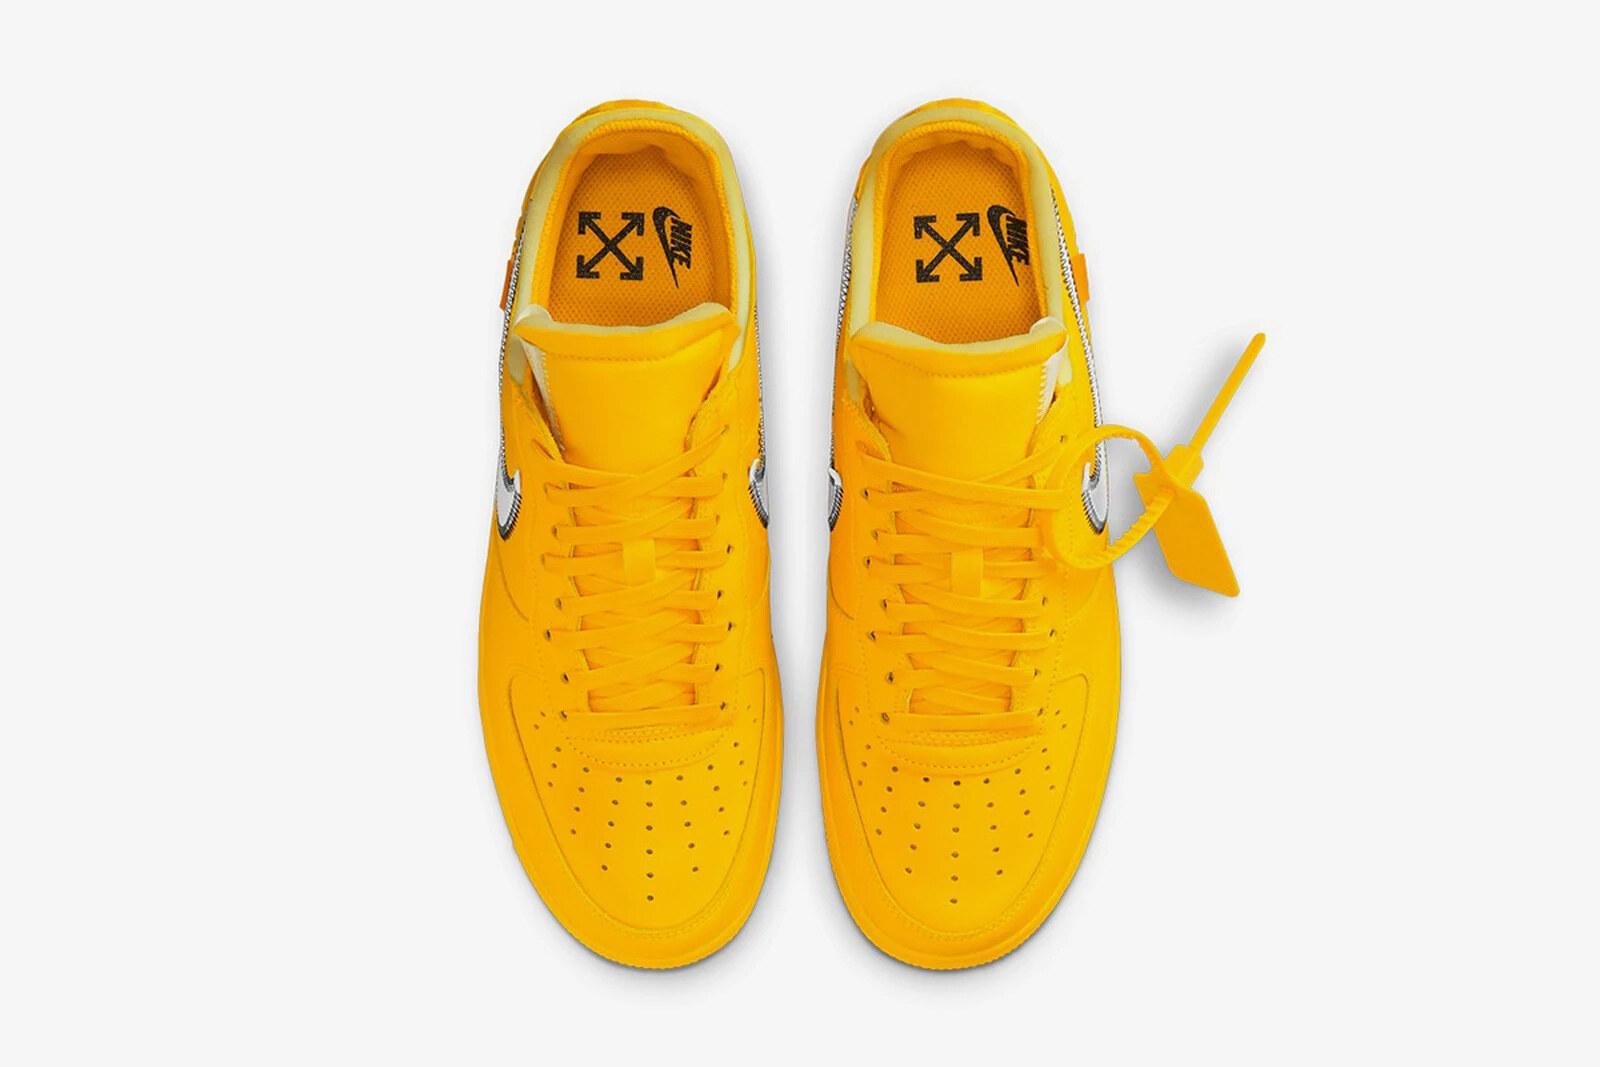 Off White x Nike Air Force 1 Lemonade